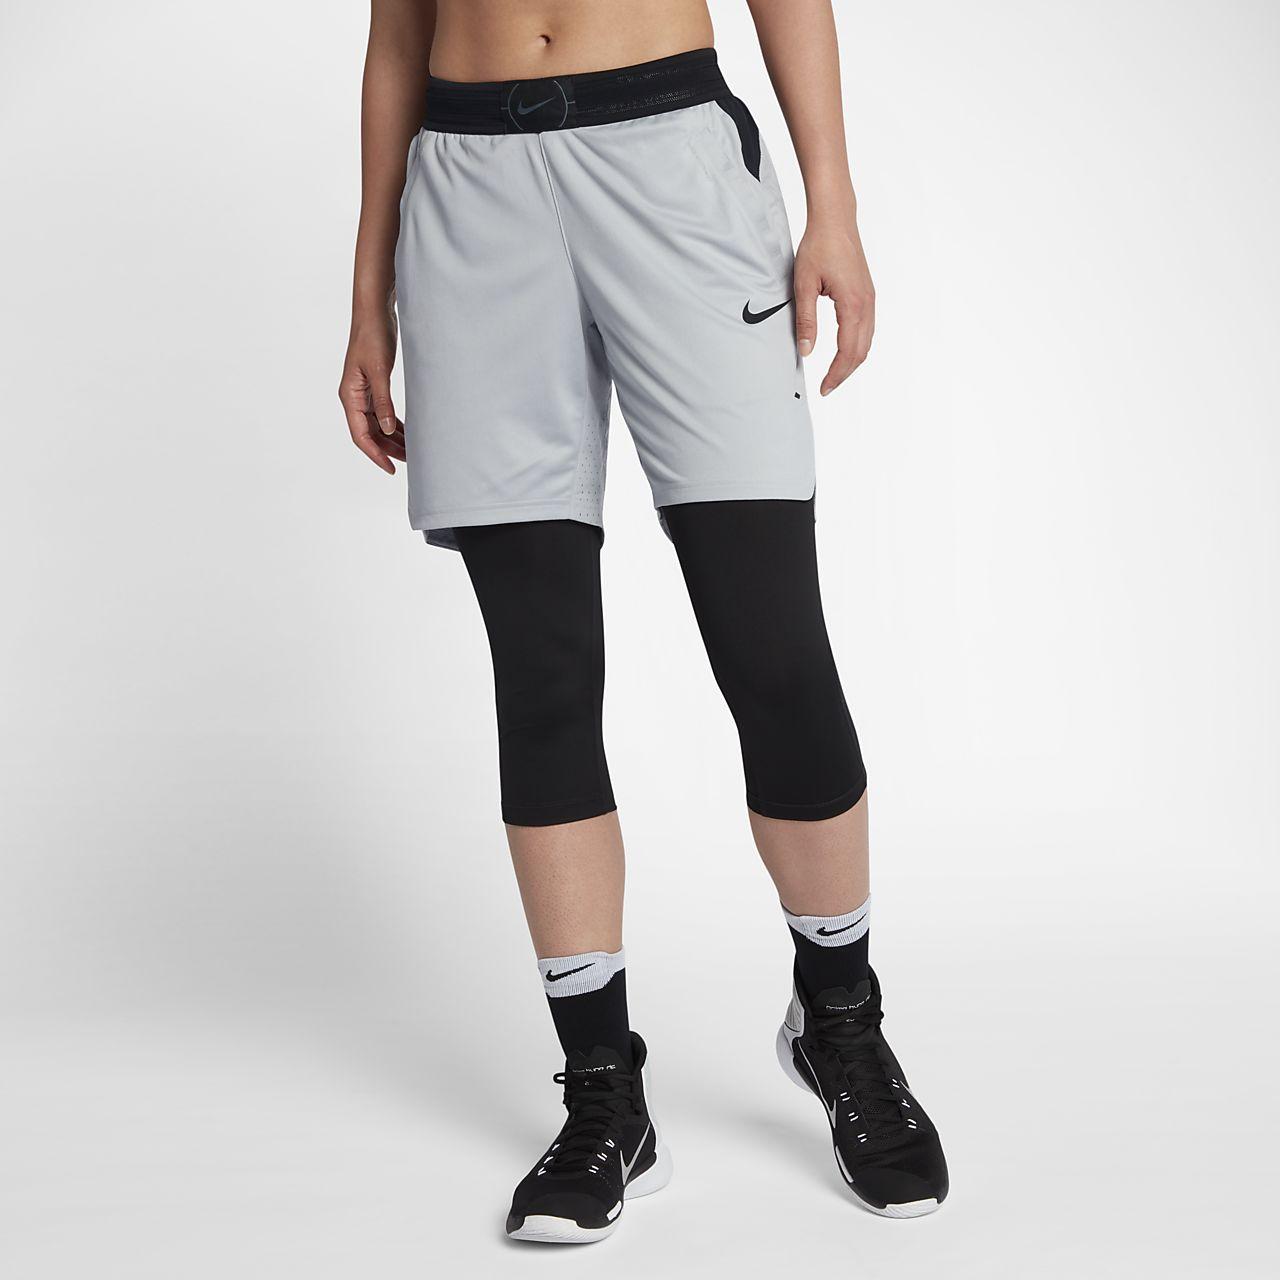 218a9b7ed2a9 Basketball Shorts Nike Women s 8